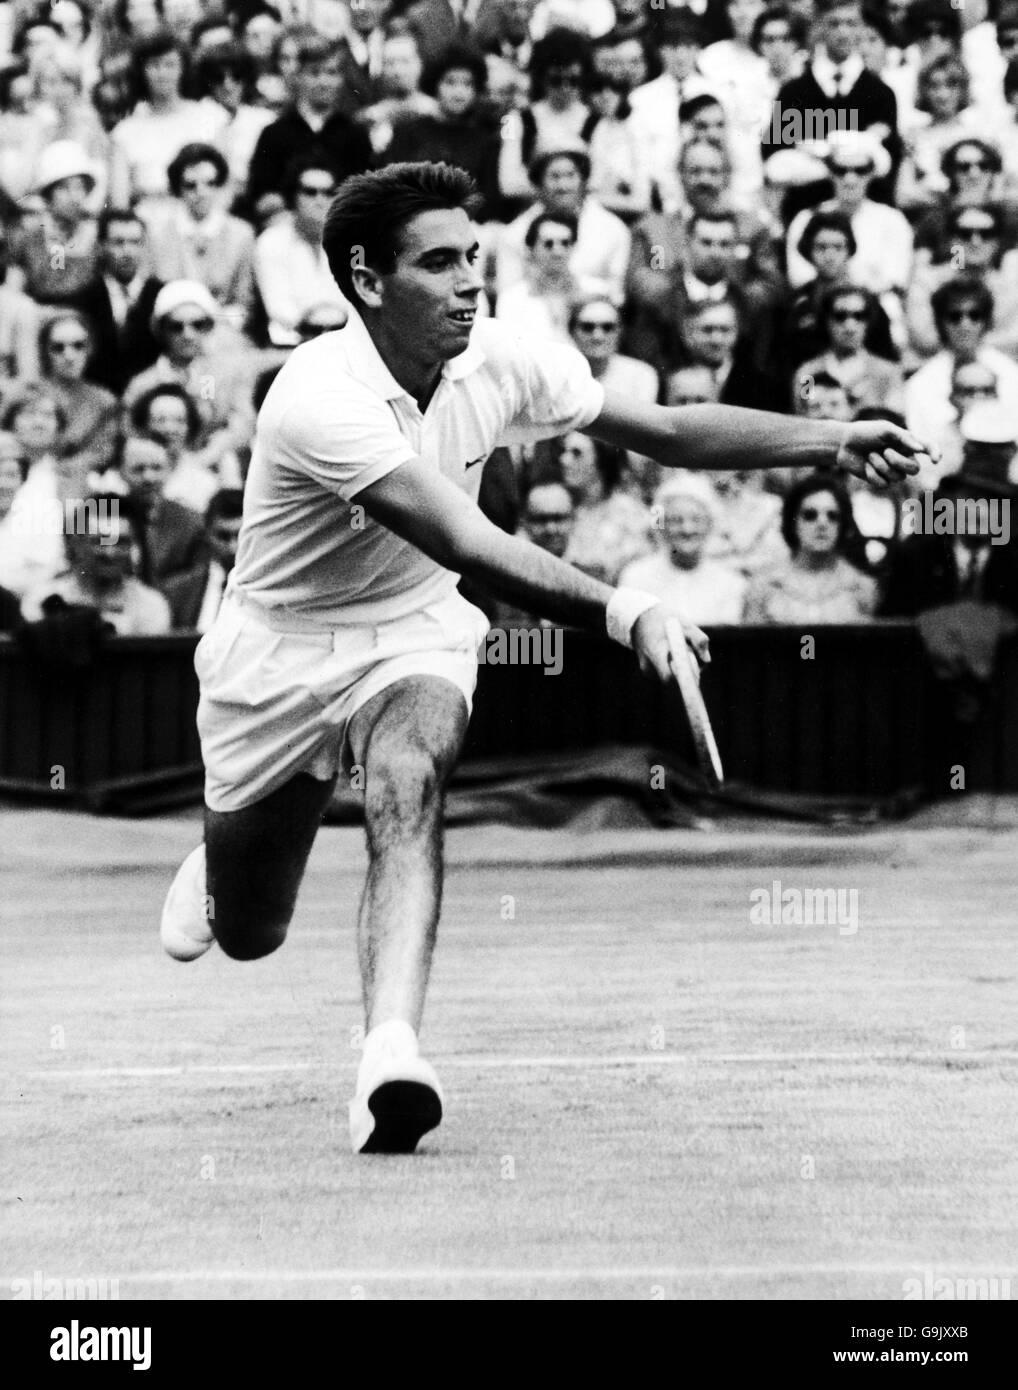 Tennis Wimbledon Championships Men s Singles Manuel Santana